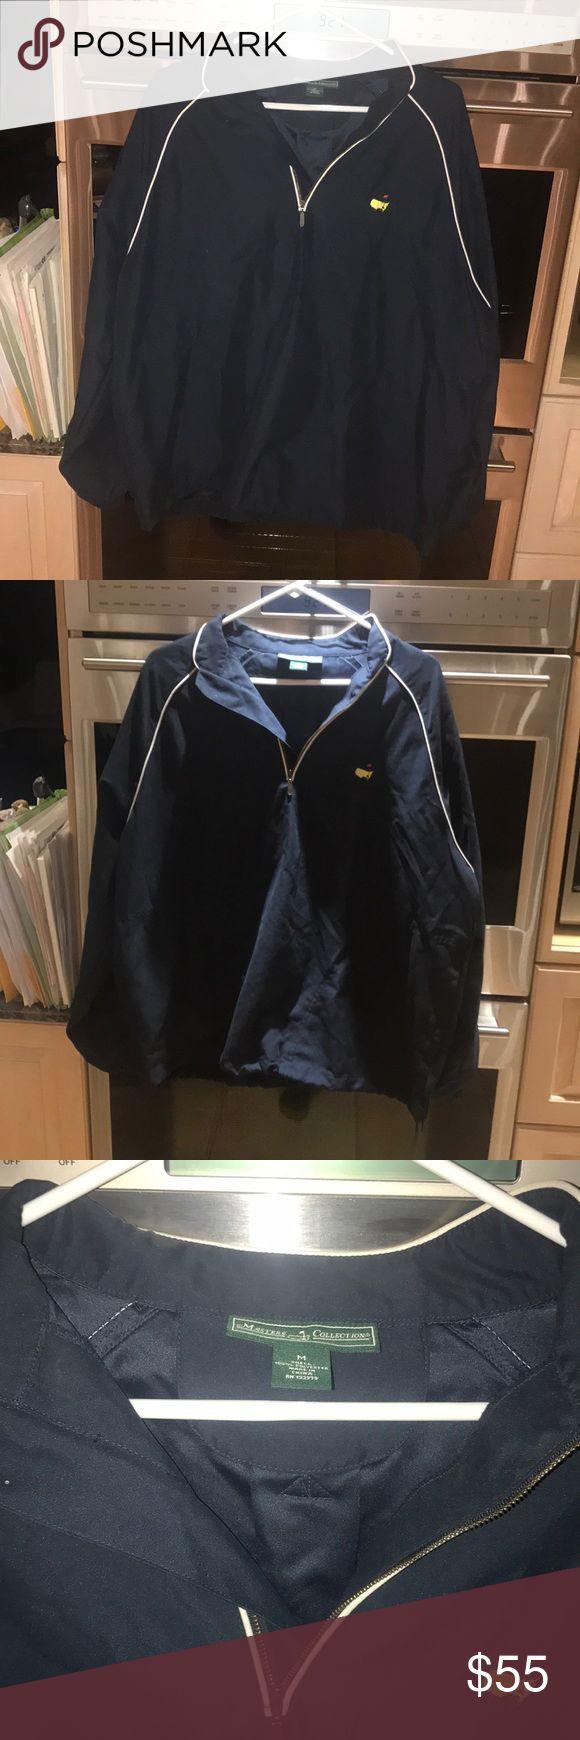 Masters 3/4 zip Golf jacket like new ⛳️⛳️ Like new men's 3/4 zip Masters Collection golf jacket size medium 100% polyester Masters Collection Jackets & Coats